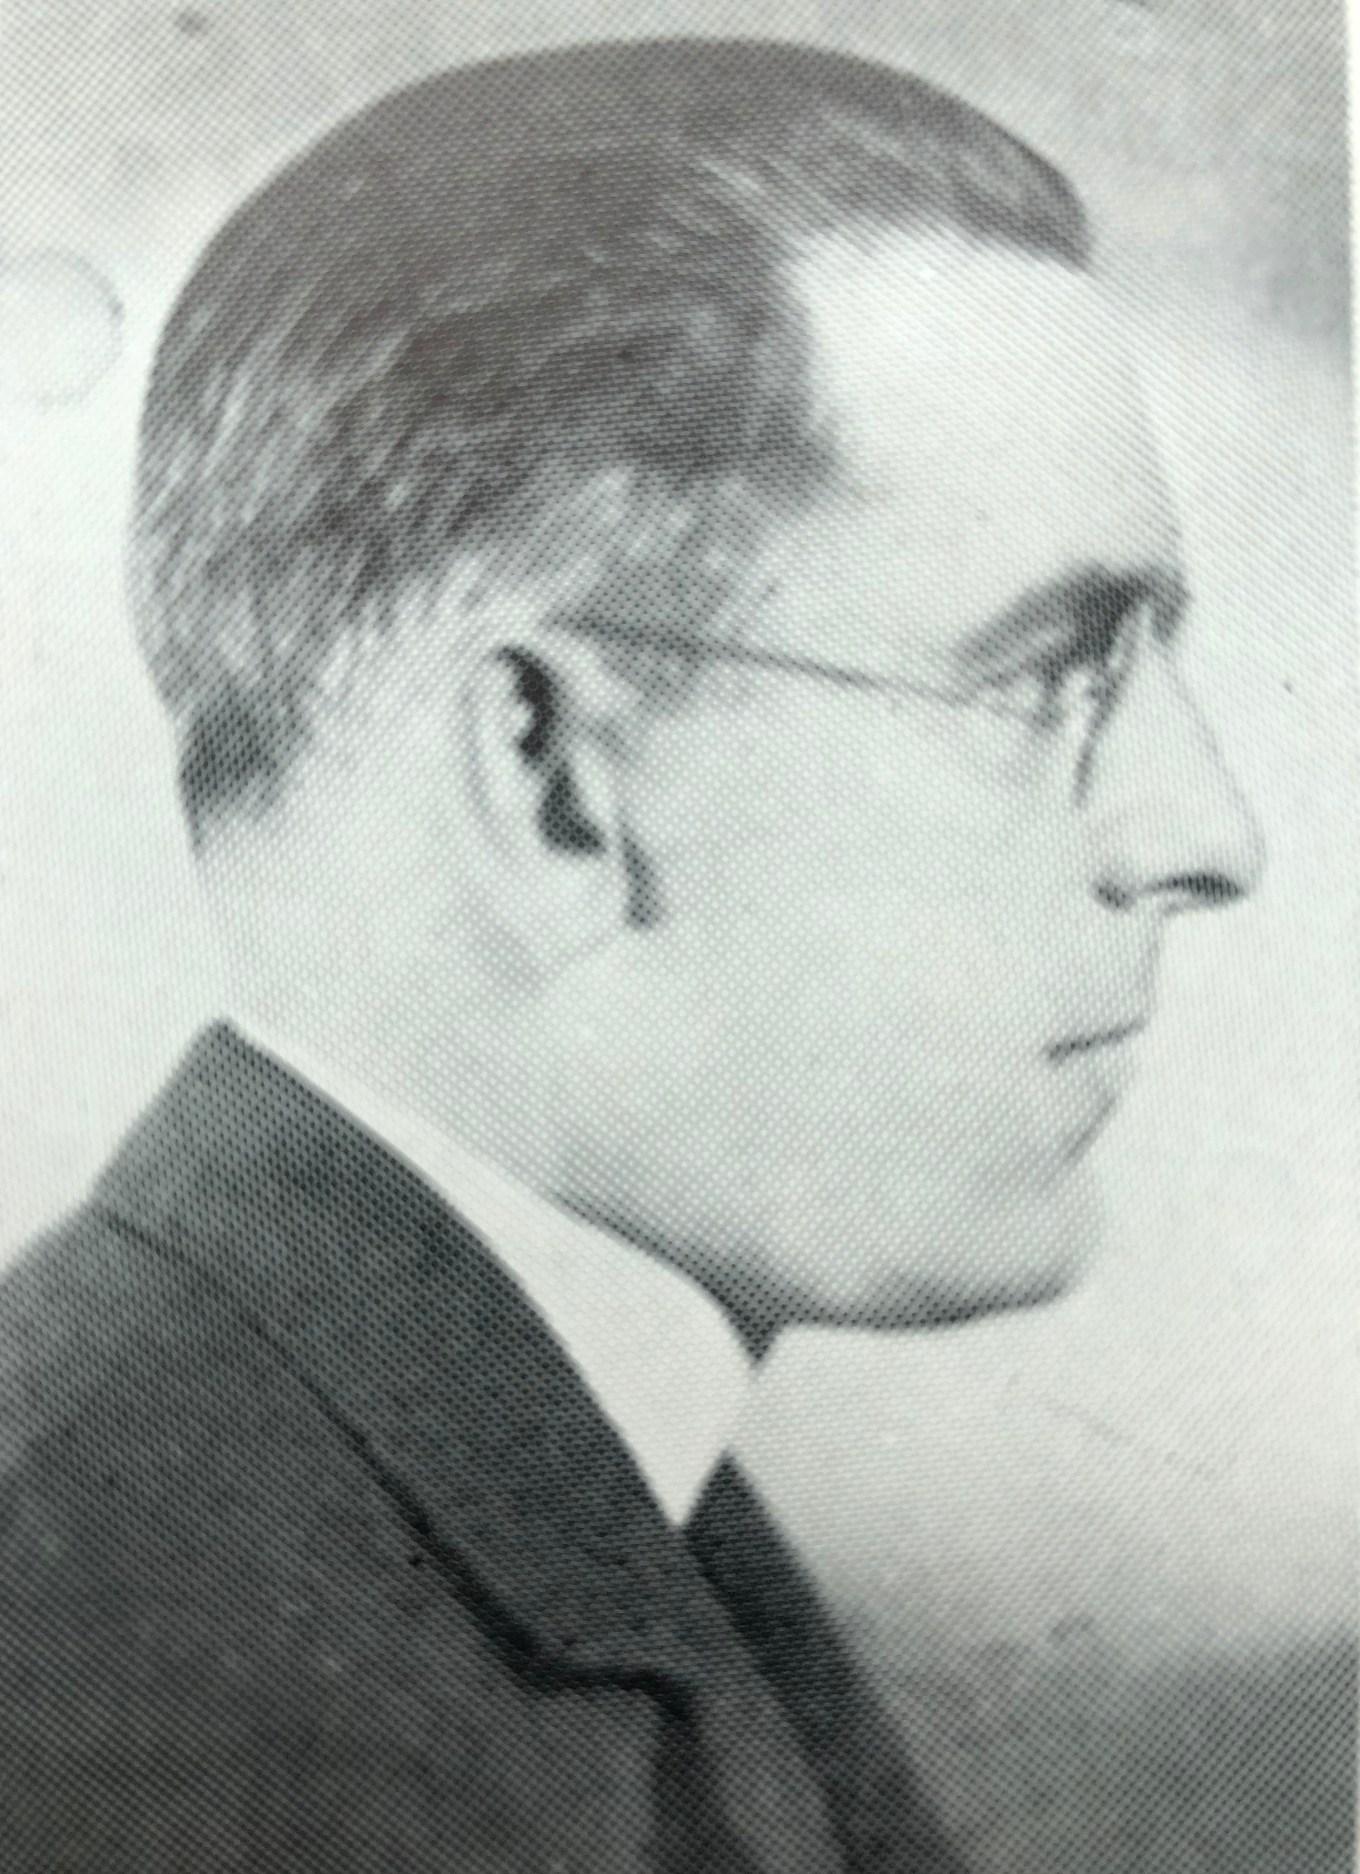 Rev. Charles A. Donoghue